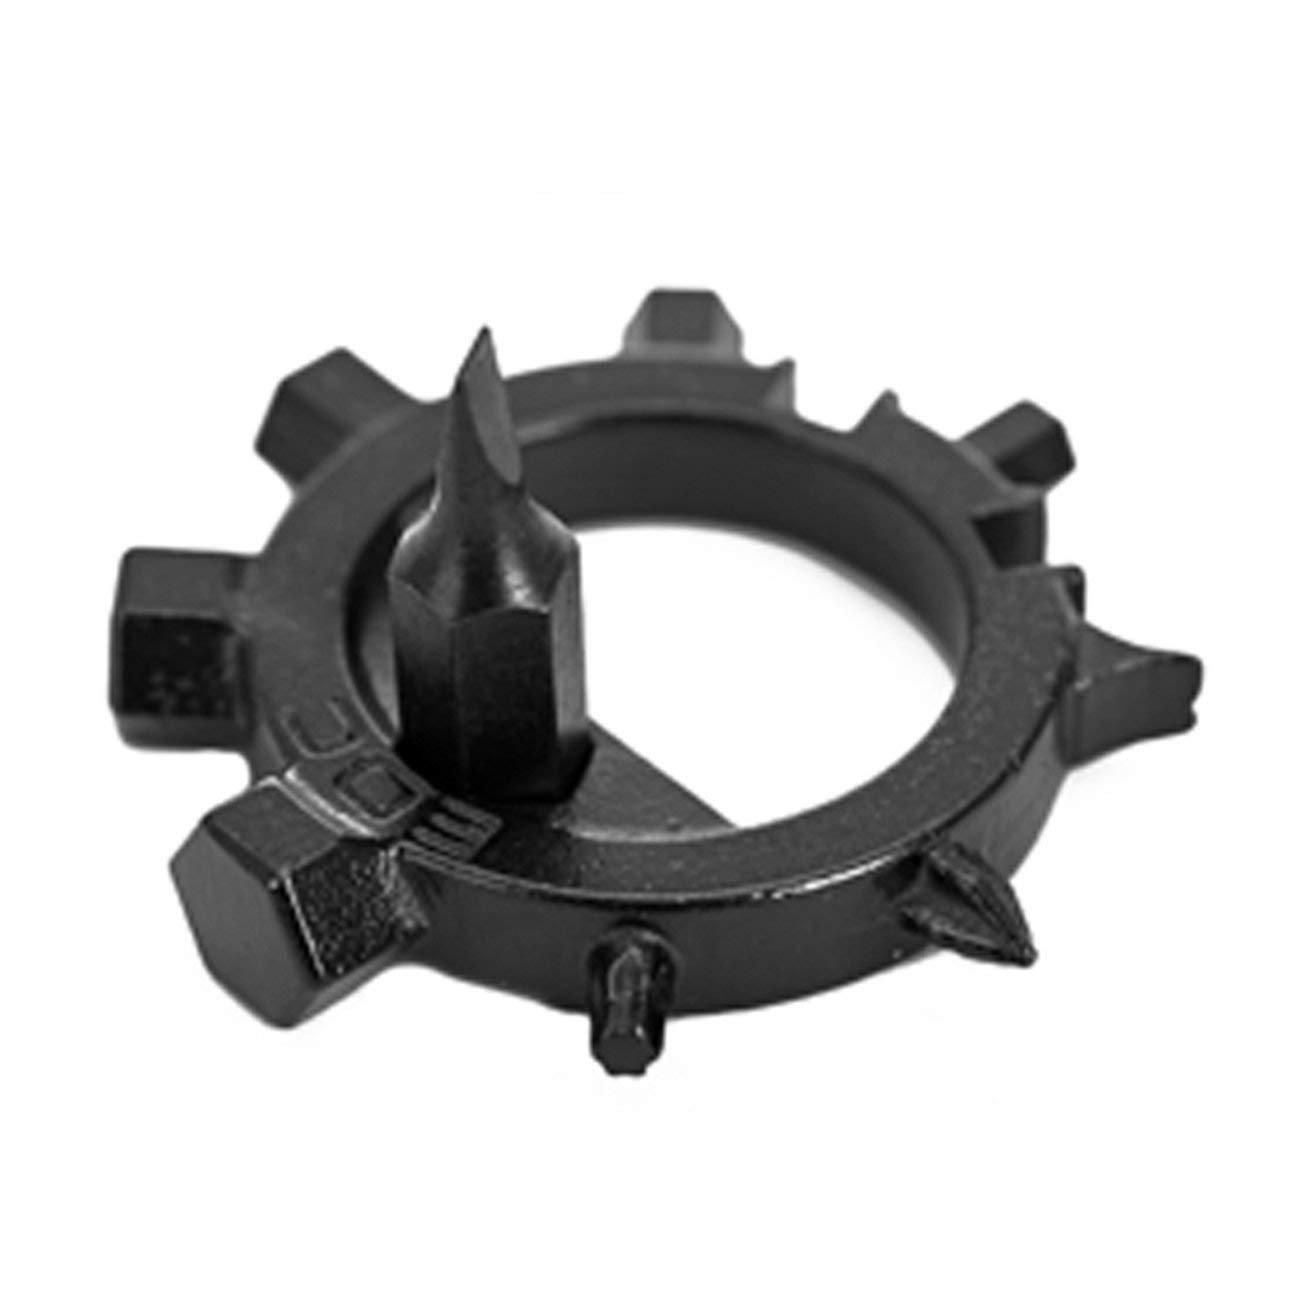 Liobaba Portable 12 Functions Gear Stainless Steel Octopus Bicycle Repair Tools Screwdriver Outdoor Multifunctional Tool